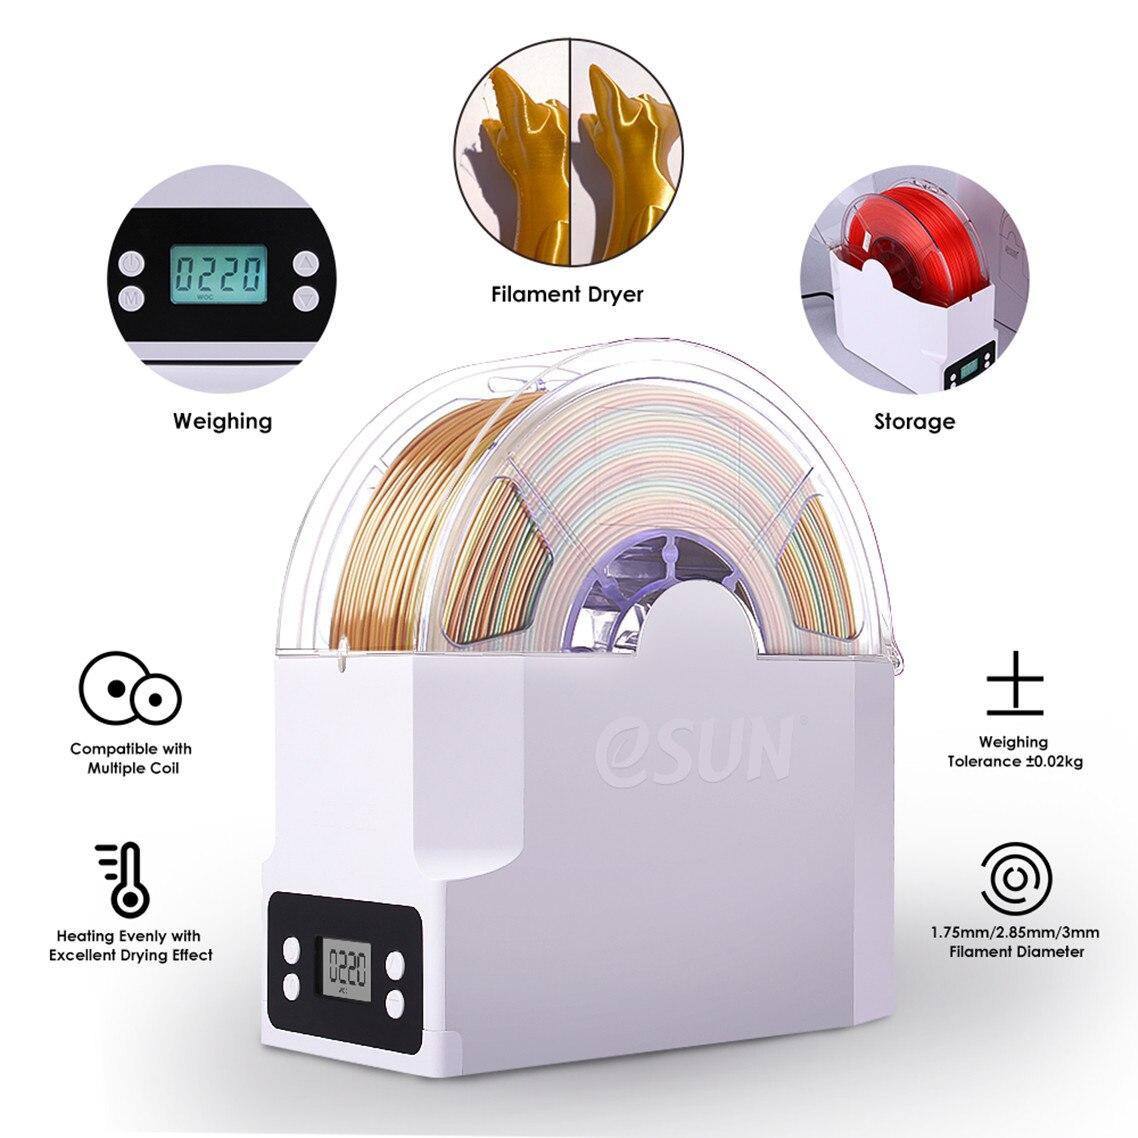 Esun ebox suporte de armazenamento do filamento